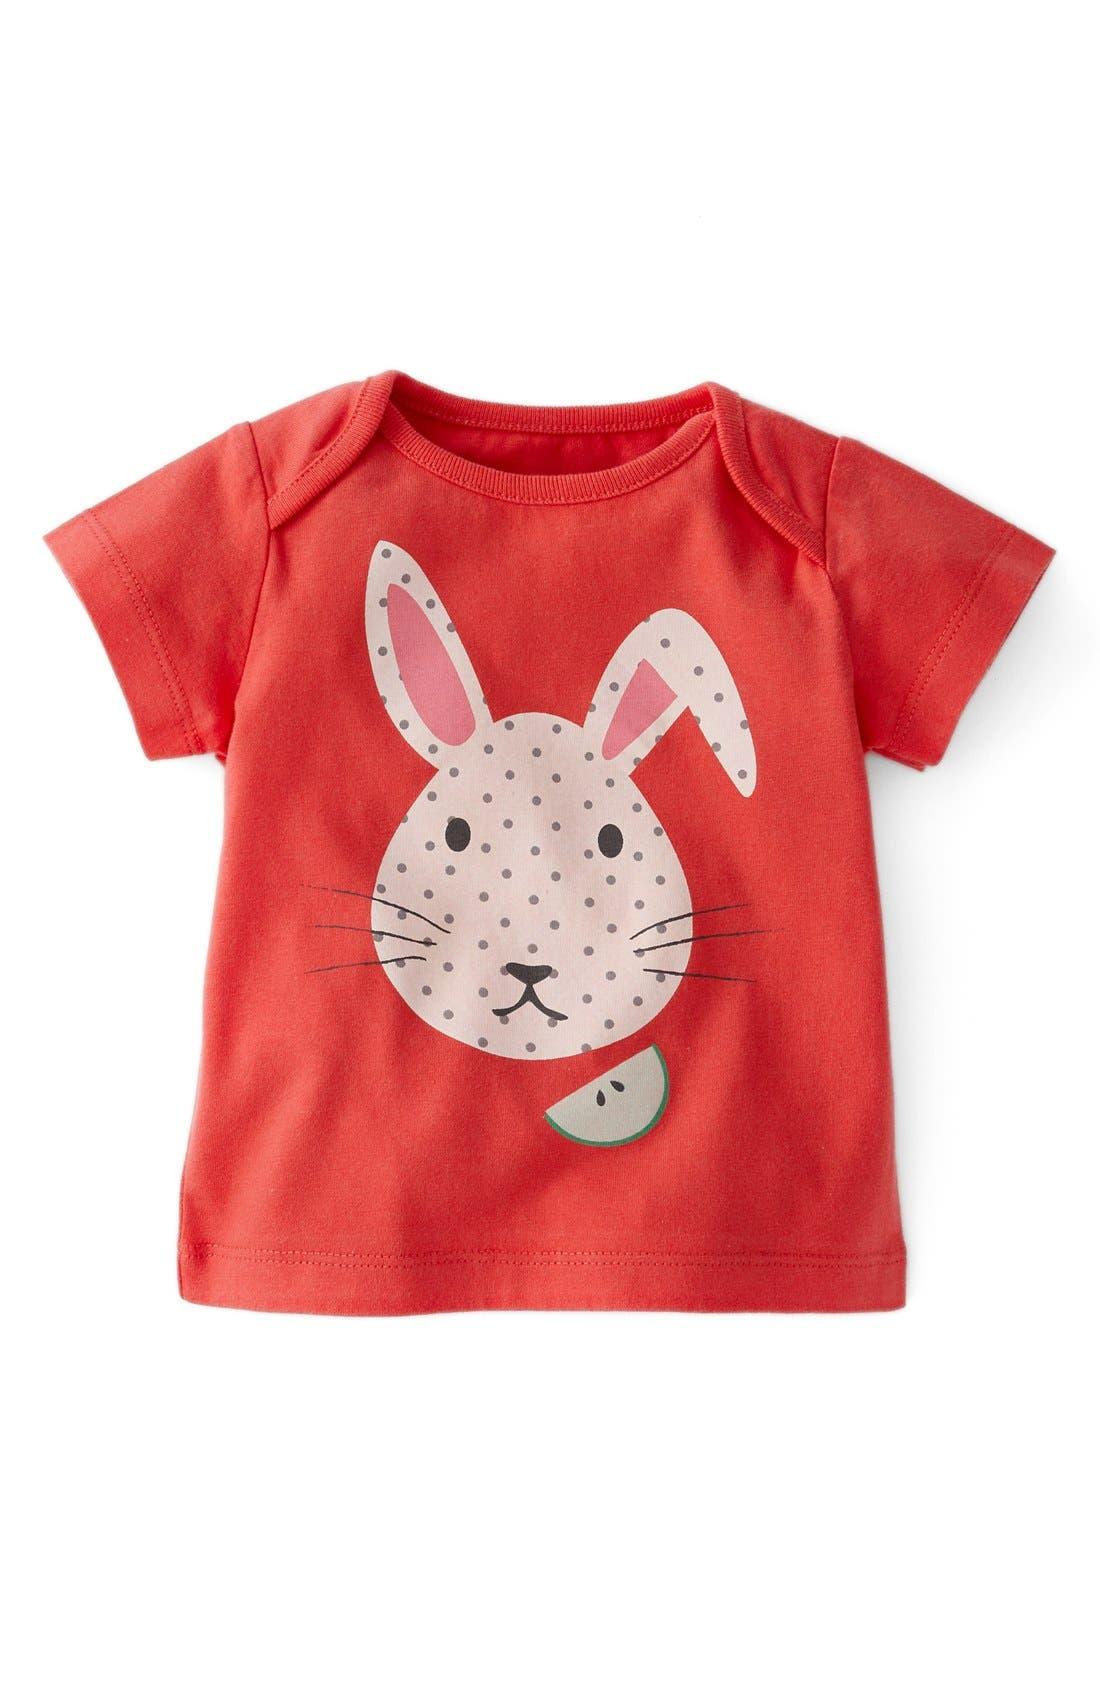 Main Image - Mini Boden 'Animal Friends' T-Shirt (Baby Girls)